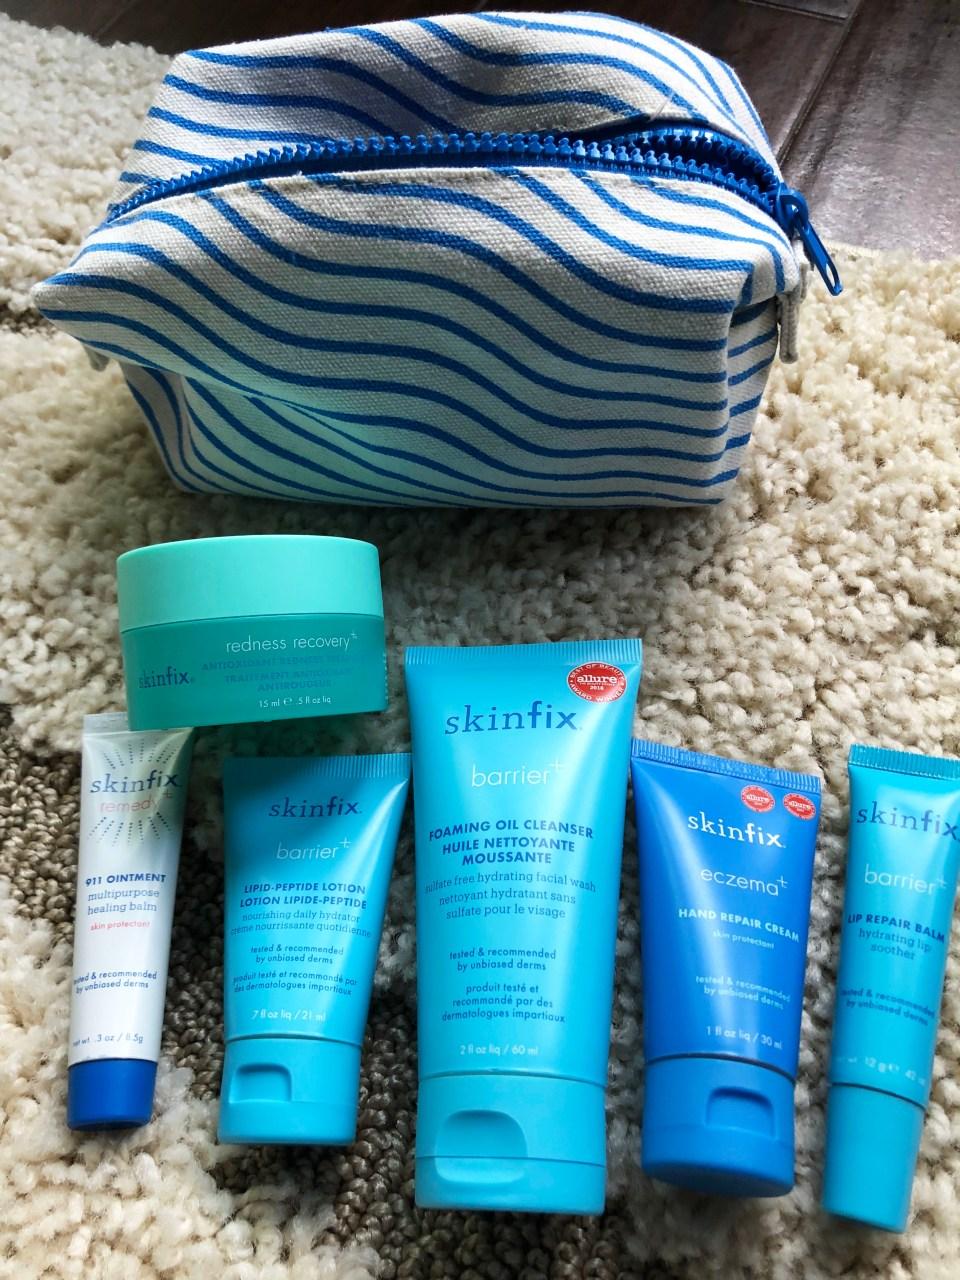 Skinfix Travel Kit 2